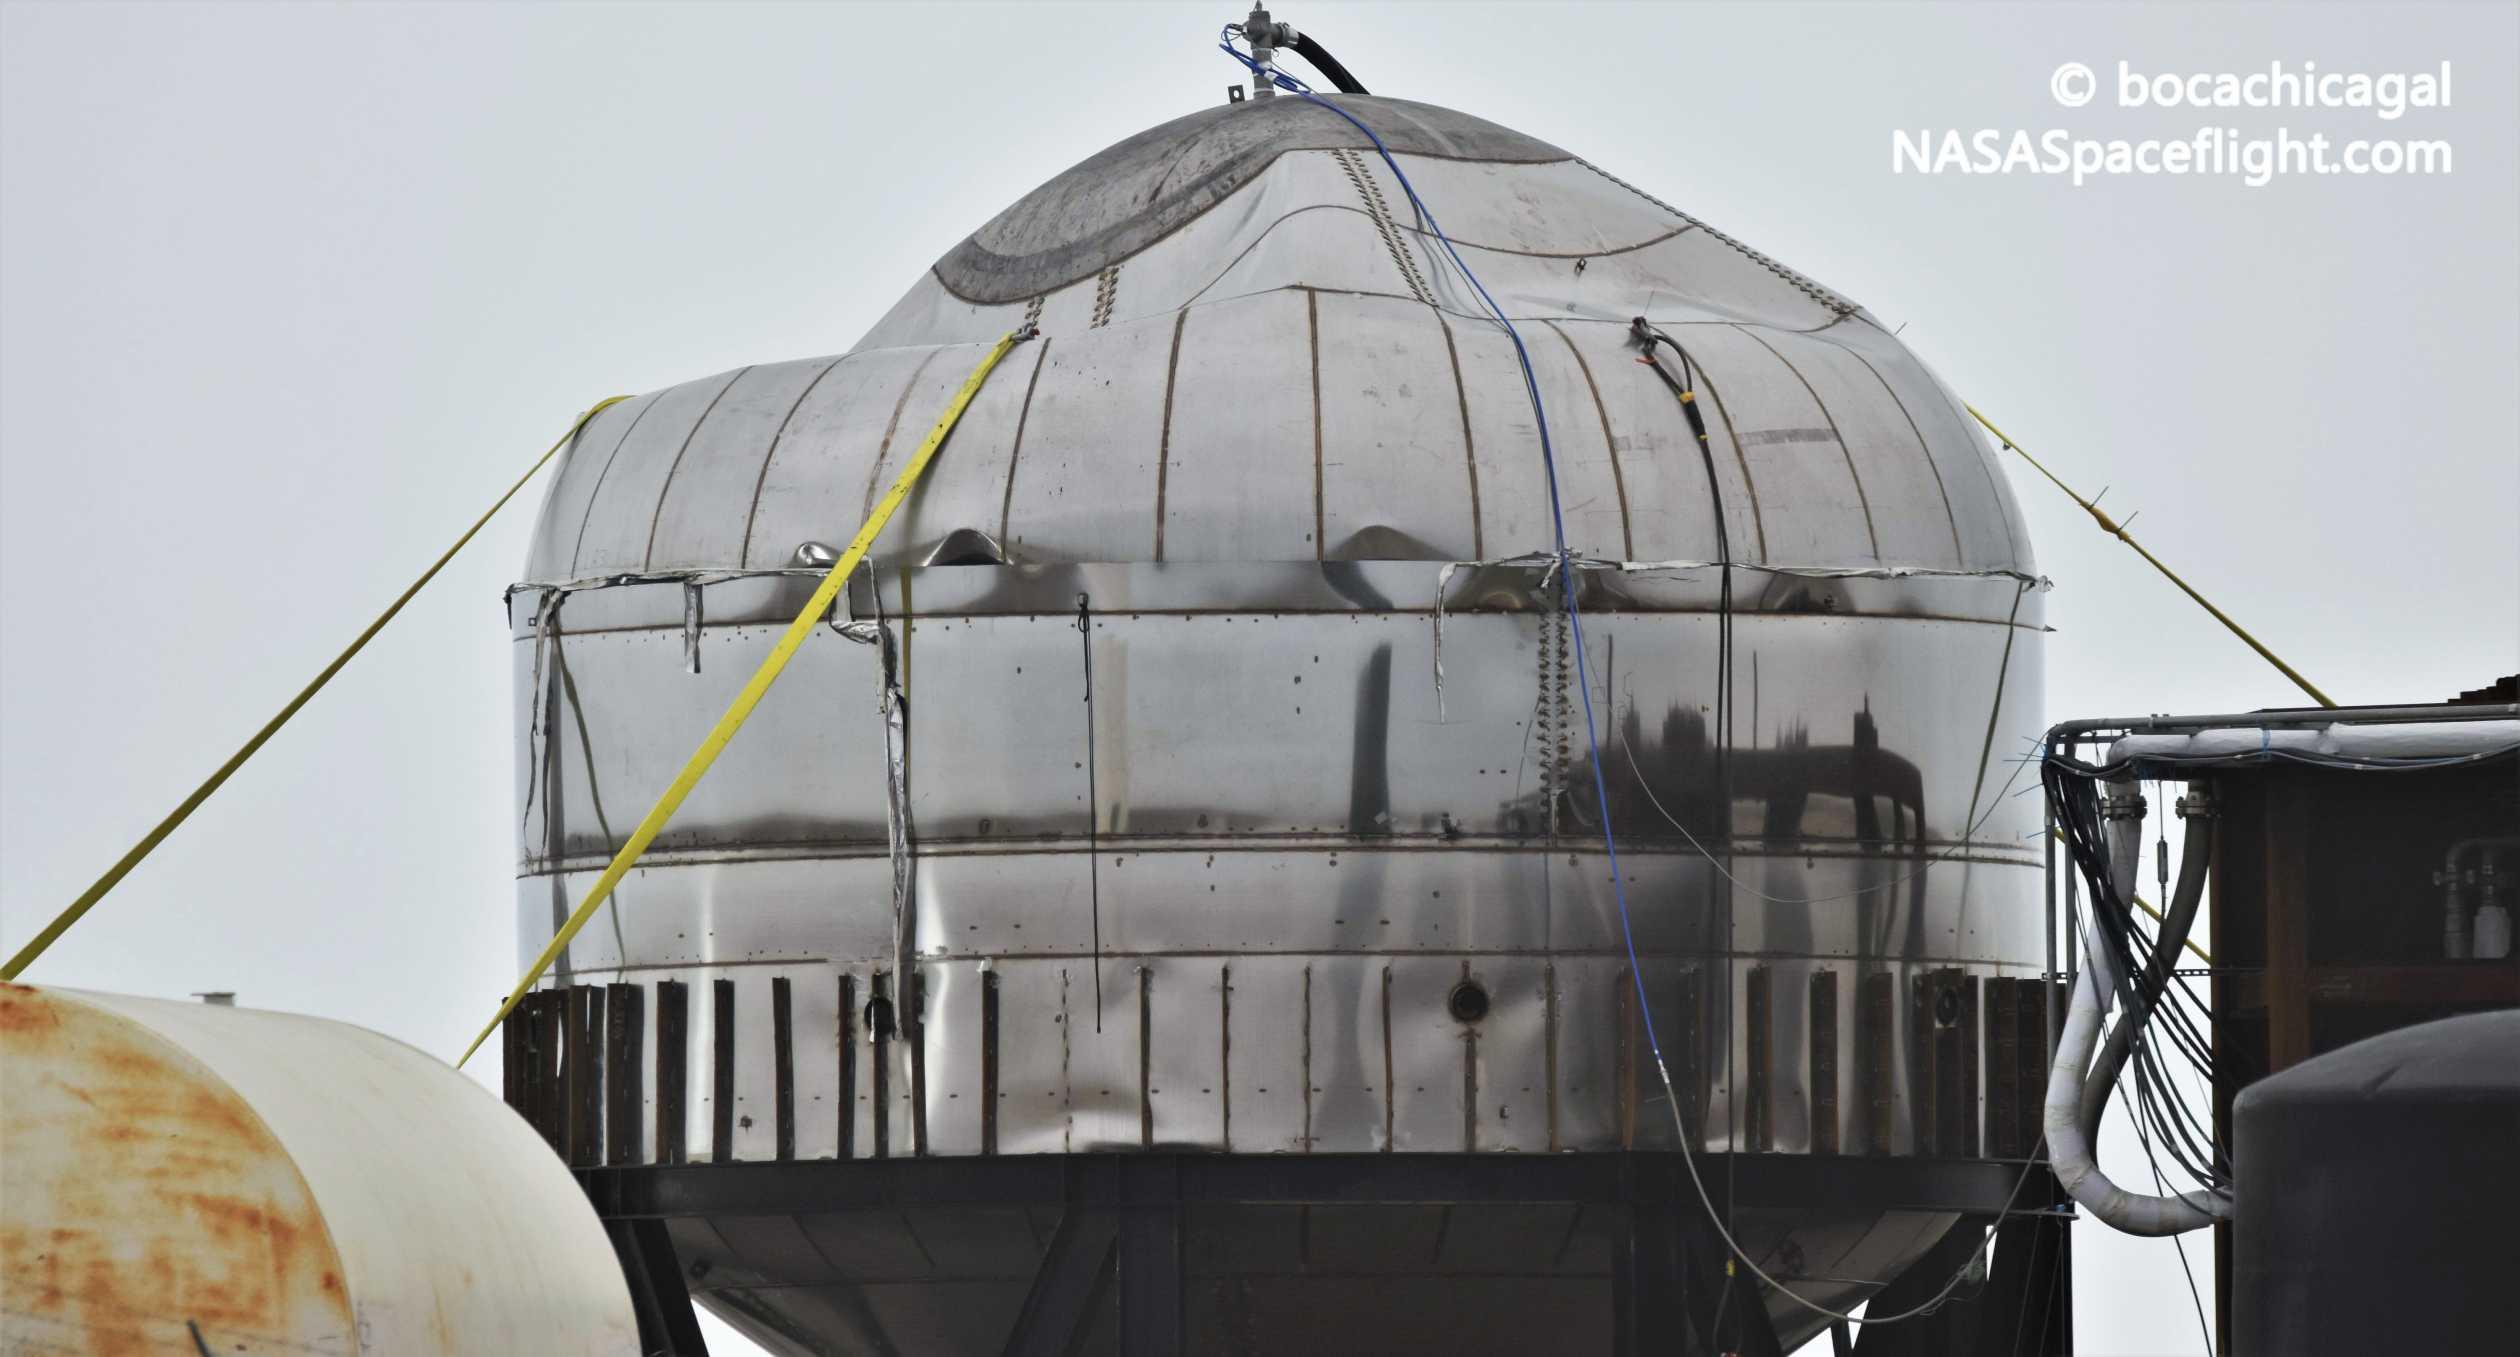 Starship Boca Chica 011020 (NASASpaceflight – bocachicagal) tank post test 2 crop (c)